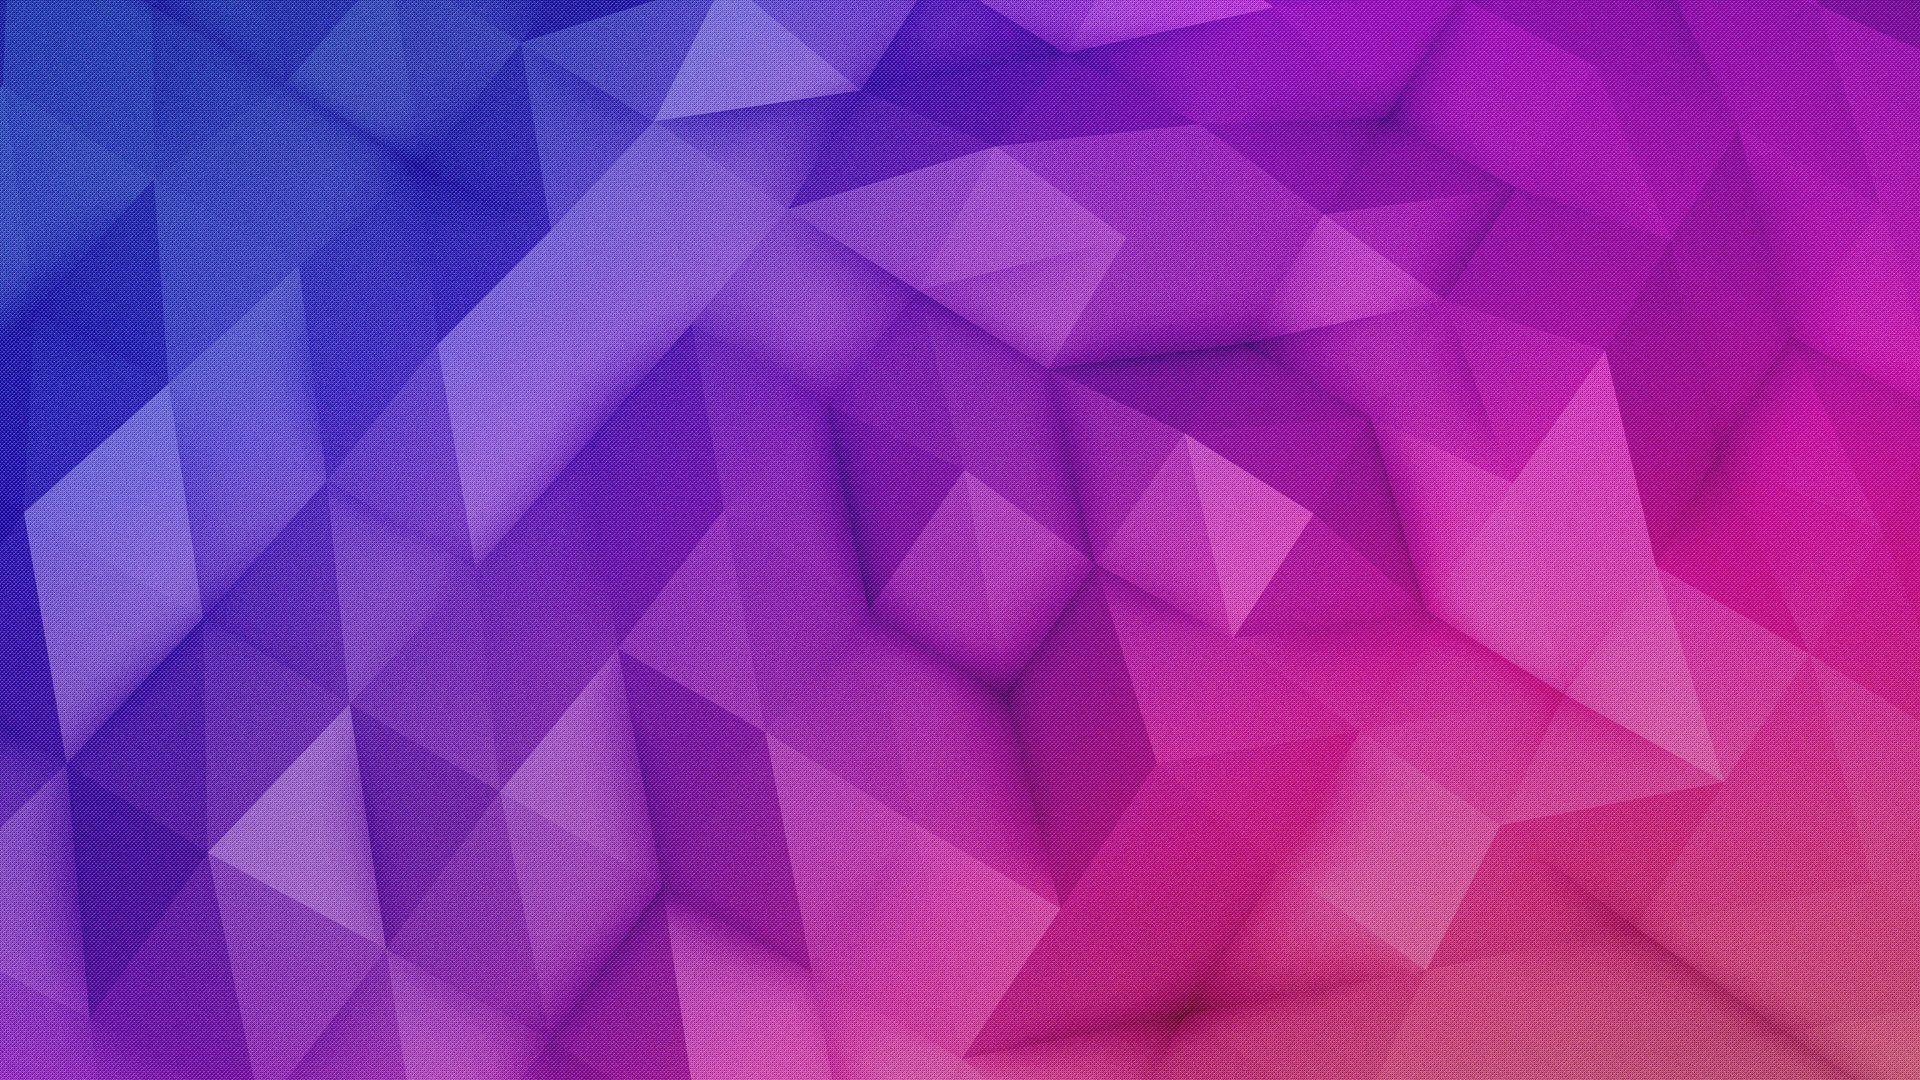 Cool Wallpaper Macbook Geometric - 5c0df60223133ee7ba0a18efce0252f0  Perfect Image Reference_539760.jpg